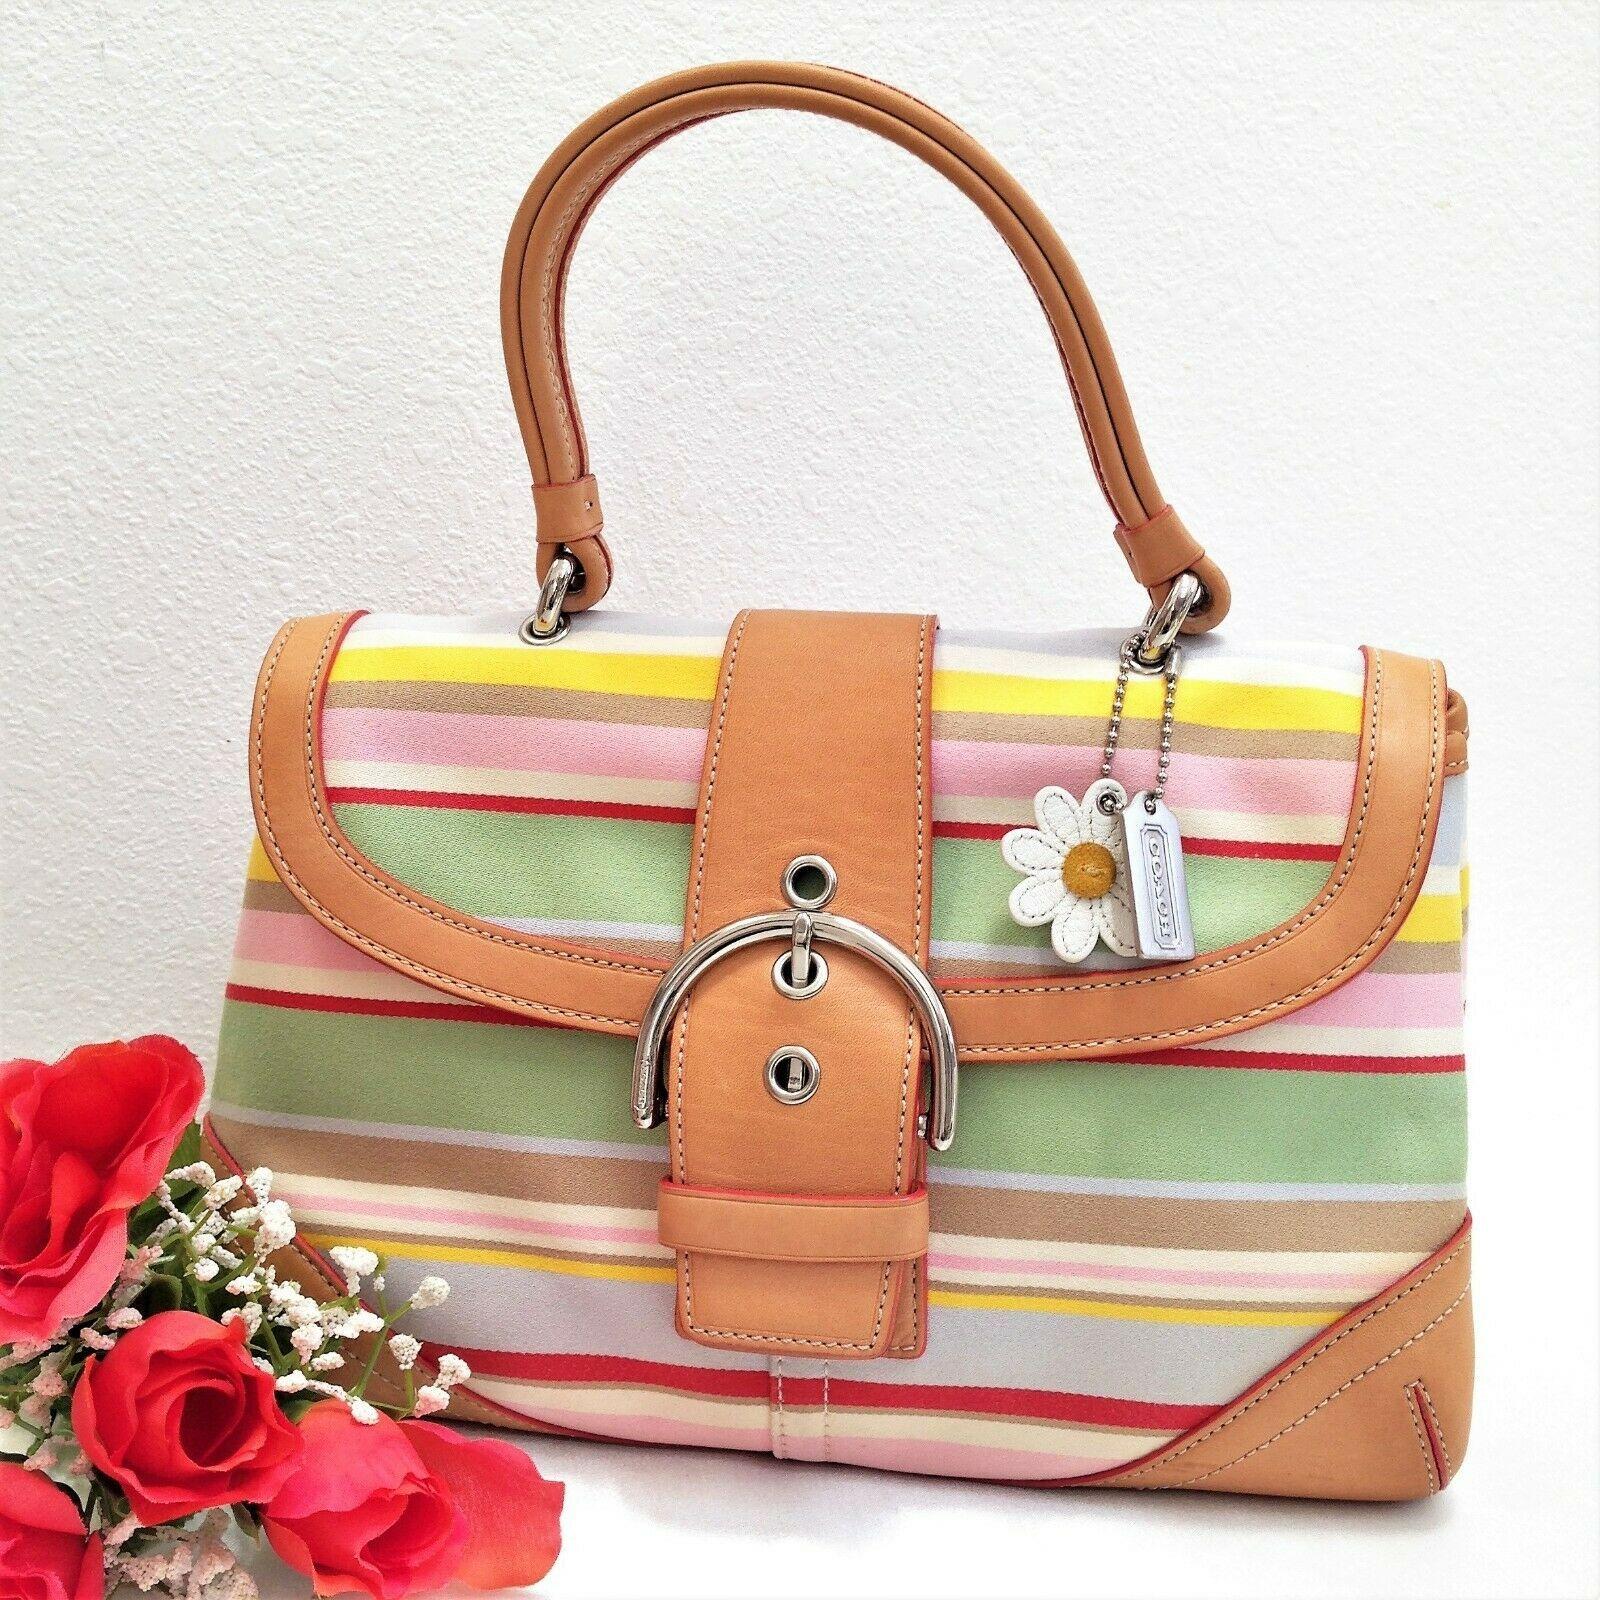 6a34af956823 COACH SOHO Twill Stripe Satchel - Multicolor Canvas & Vachetta - Style 4438  EUC - $49.49